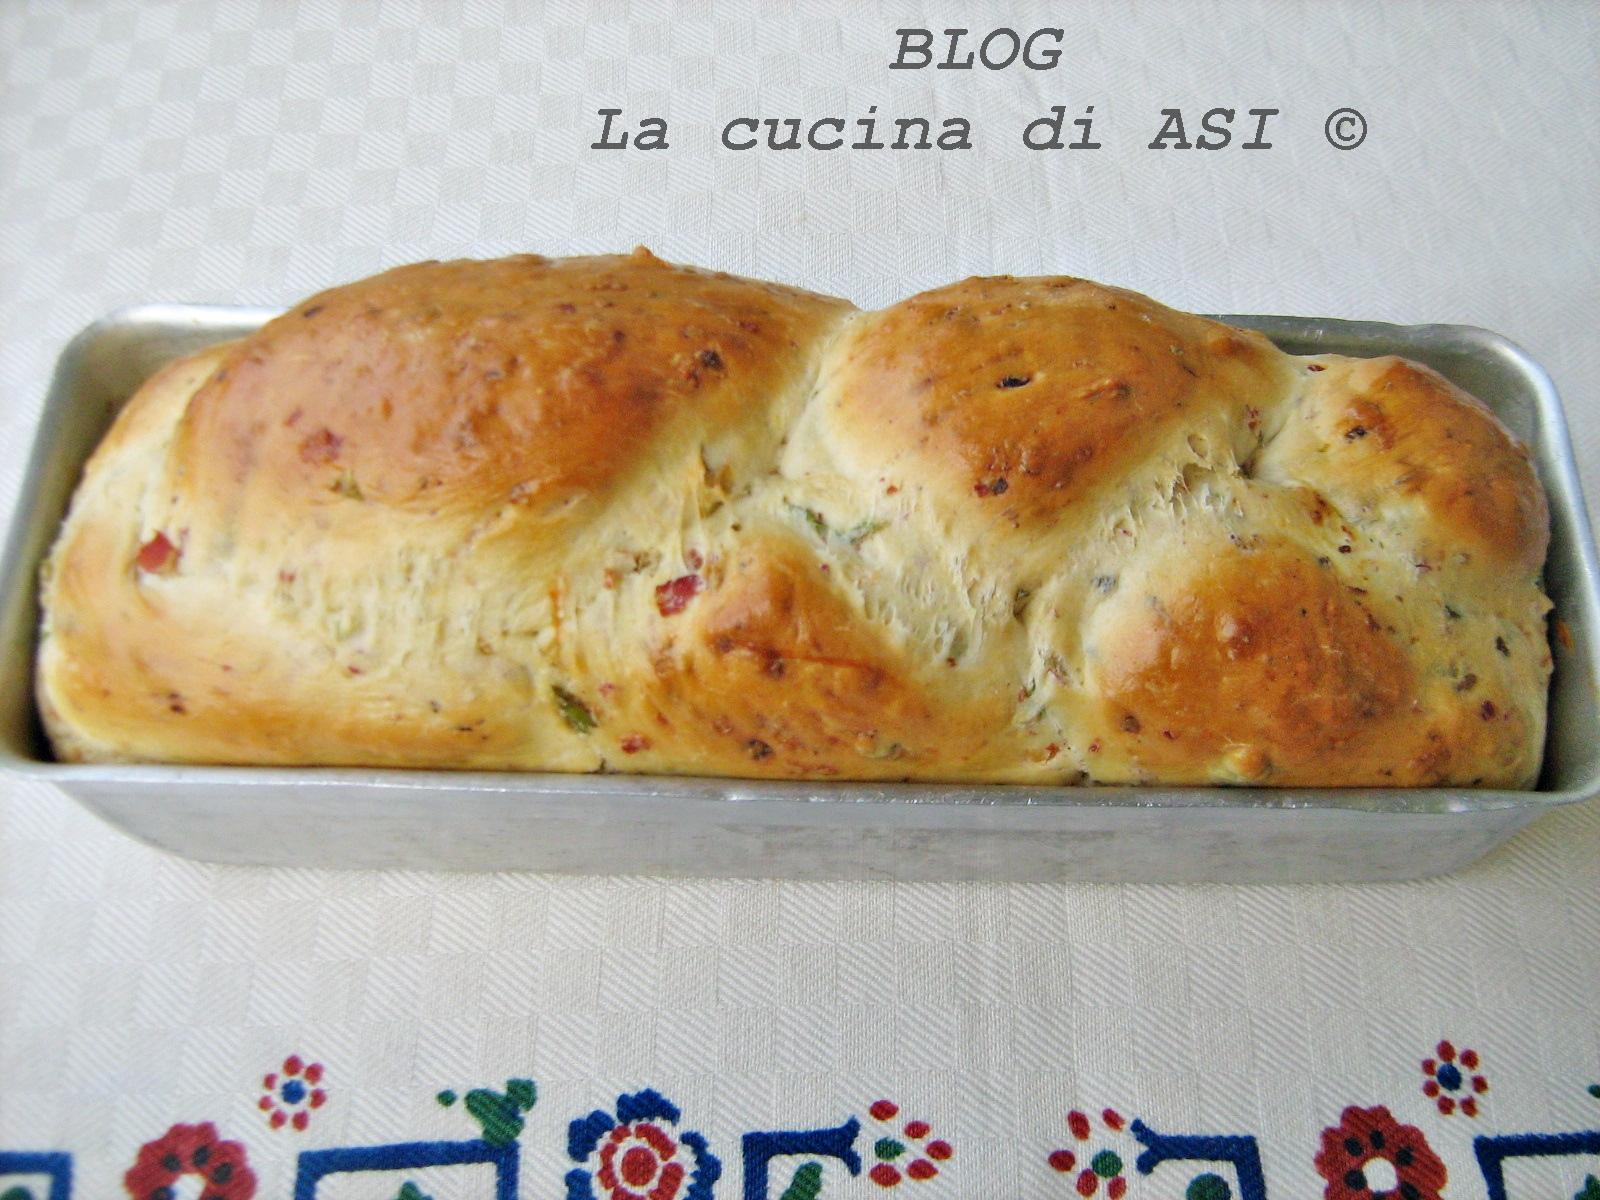 pan brioche la cucina di ASI